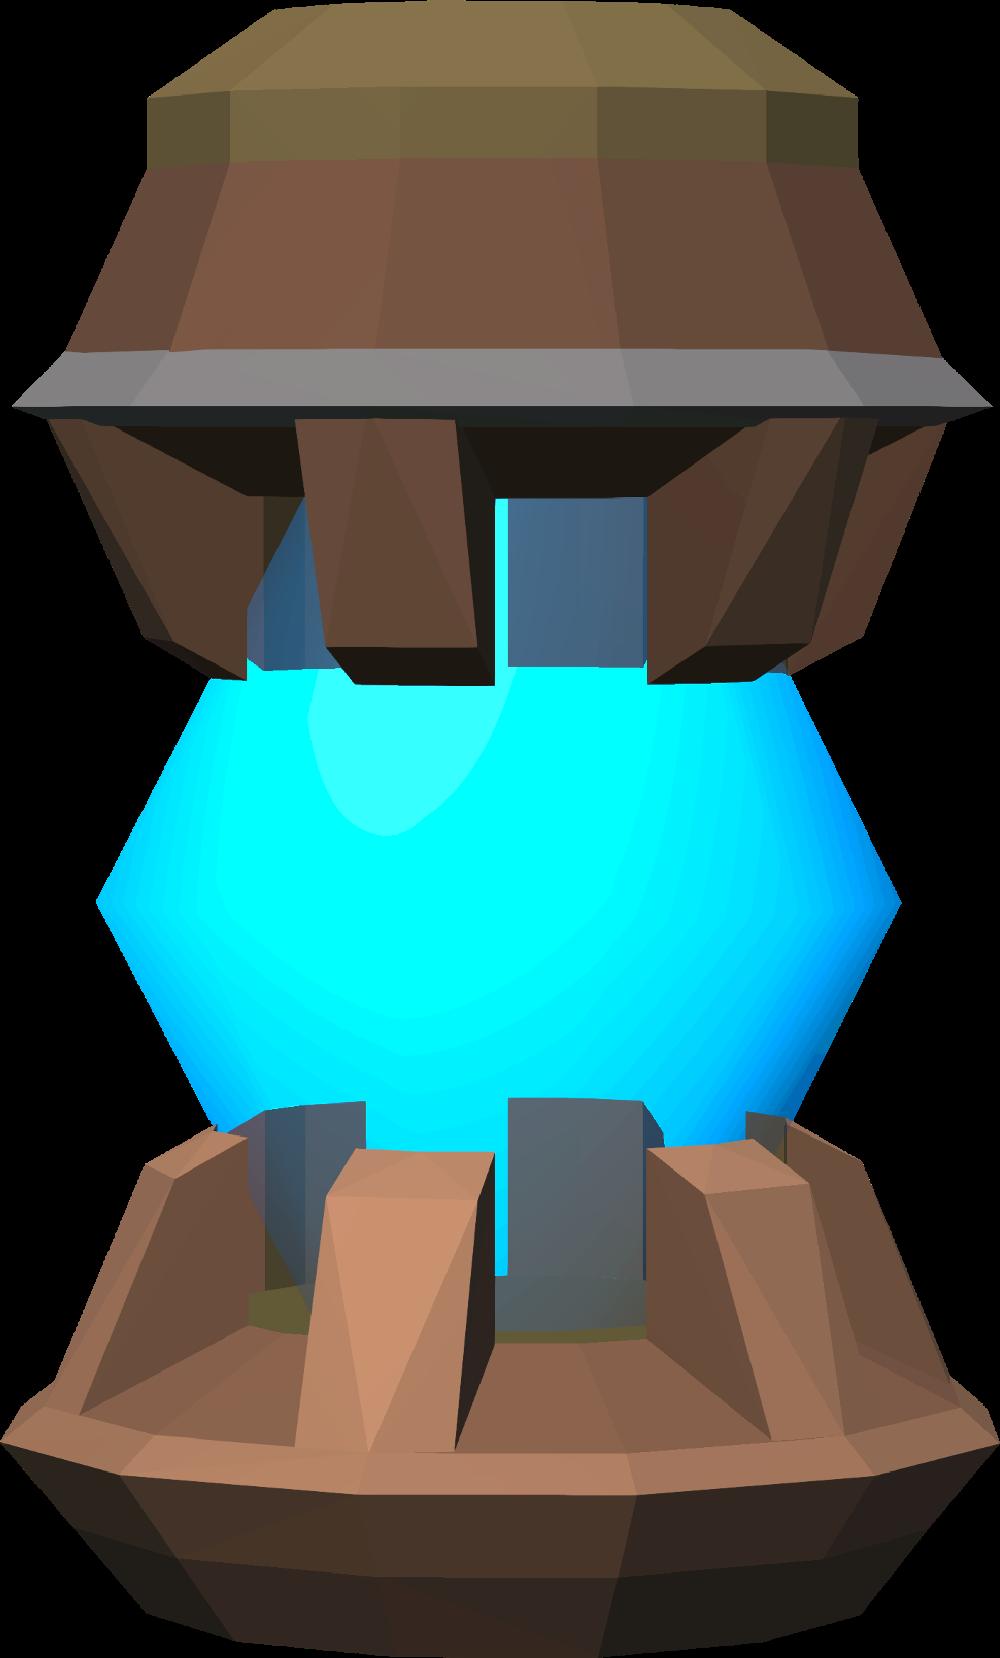 Crystal Tool Siphon Runescape Wiki Fandom Powered By Wikia